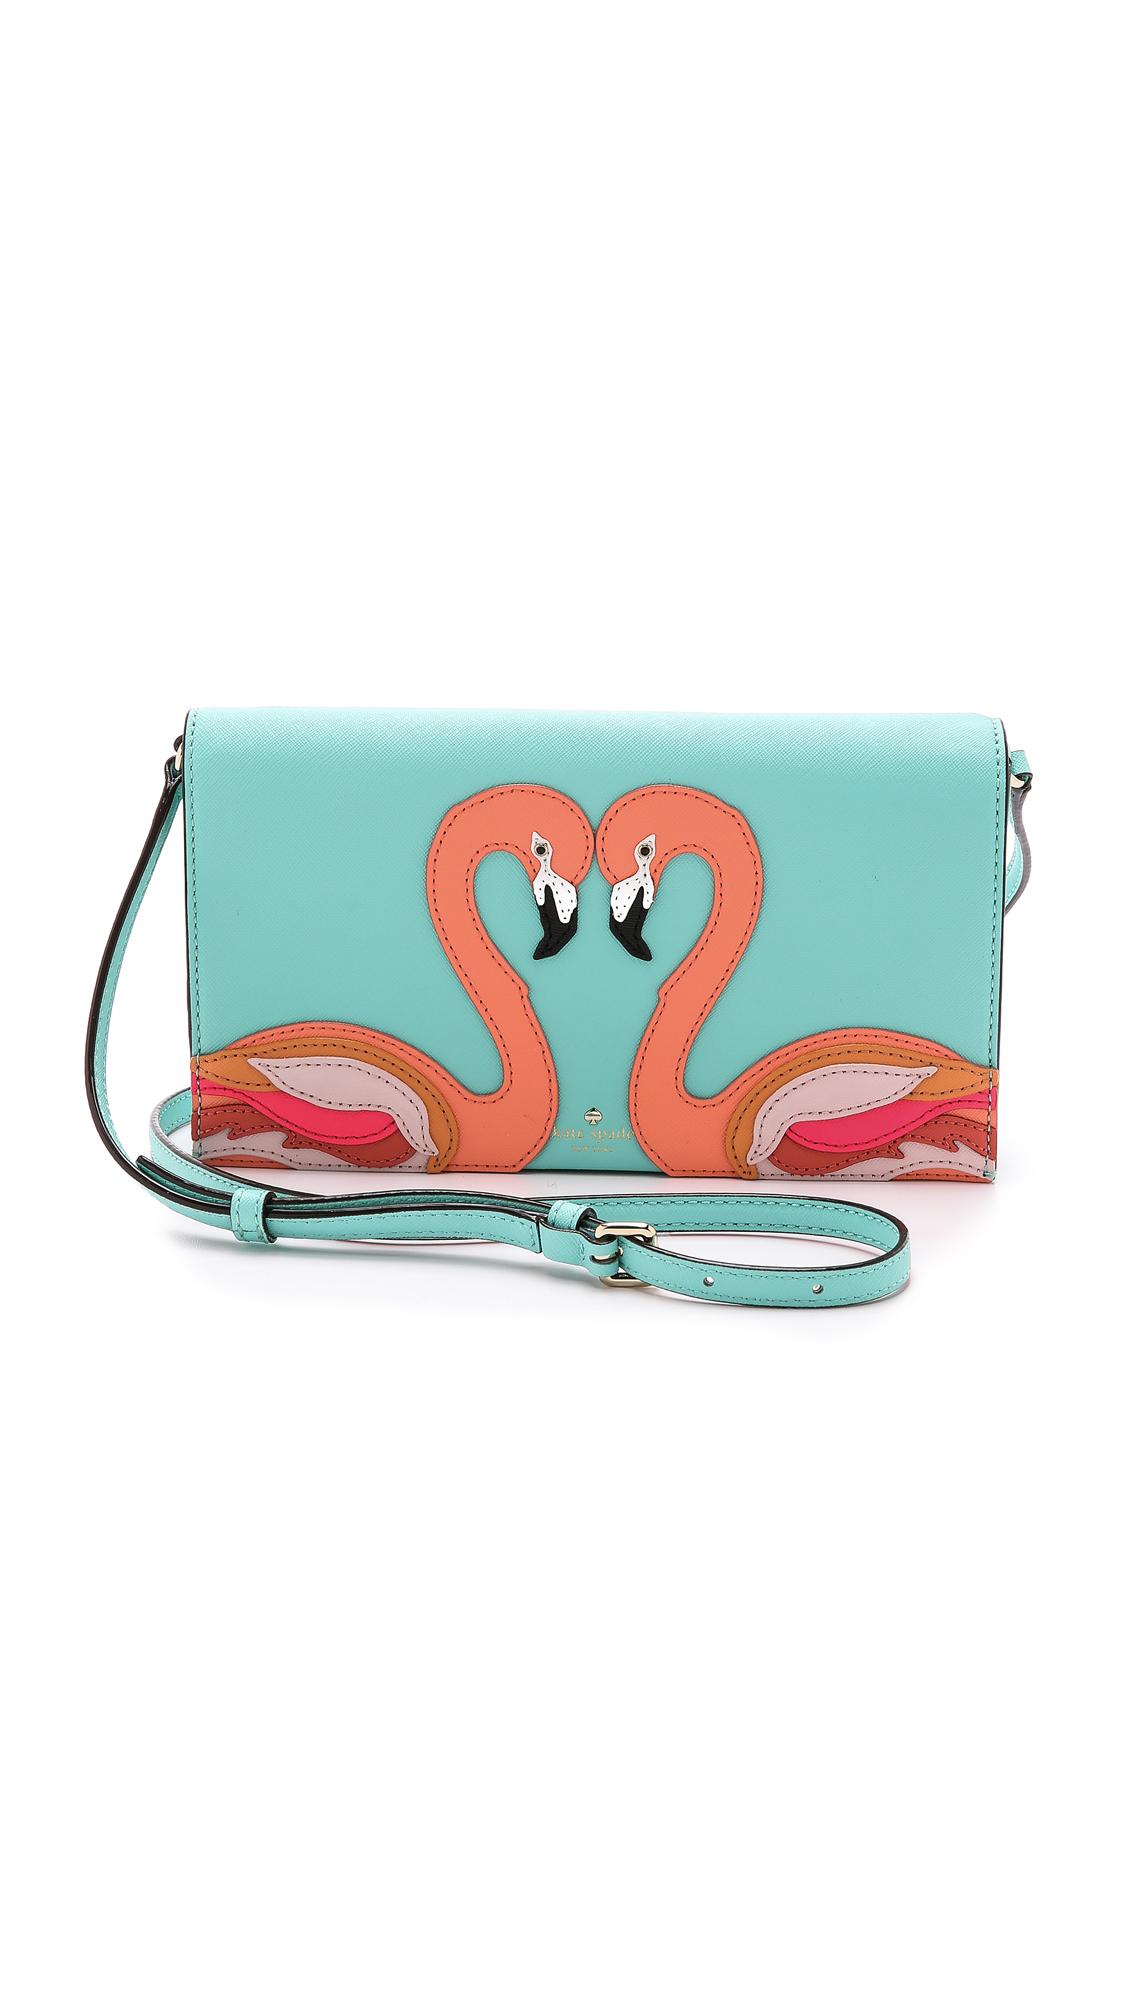 Kate Spade New York Flamingo Wallet